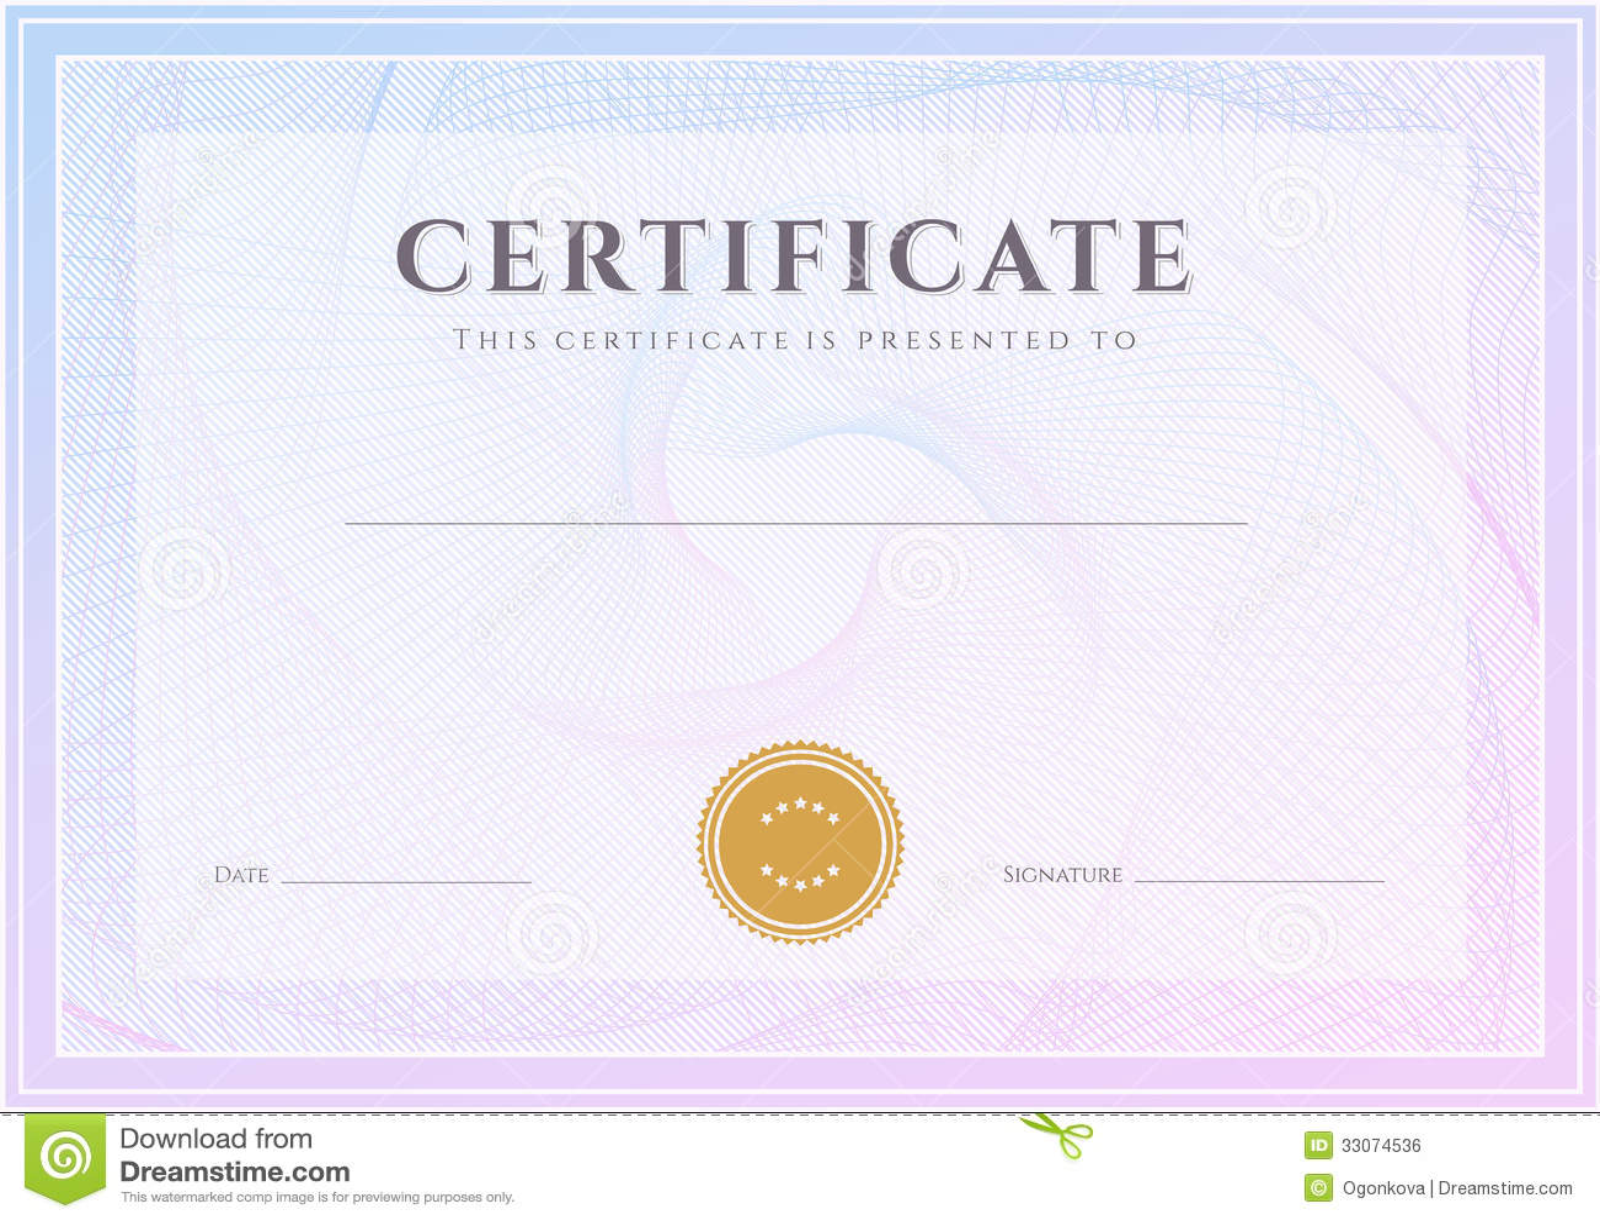 Certificate template quran images certificate design and template quran completion certificate template image collections xflitez Image collections